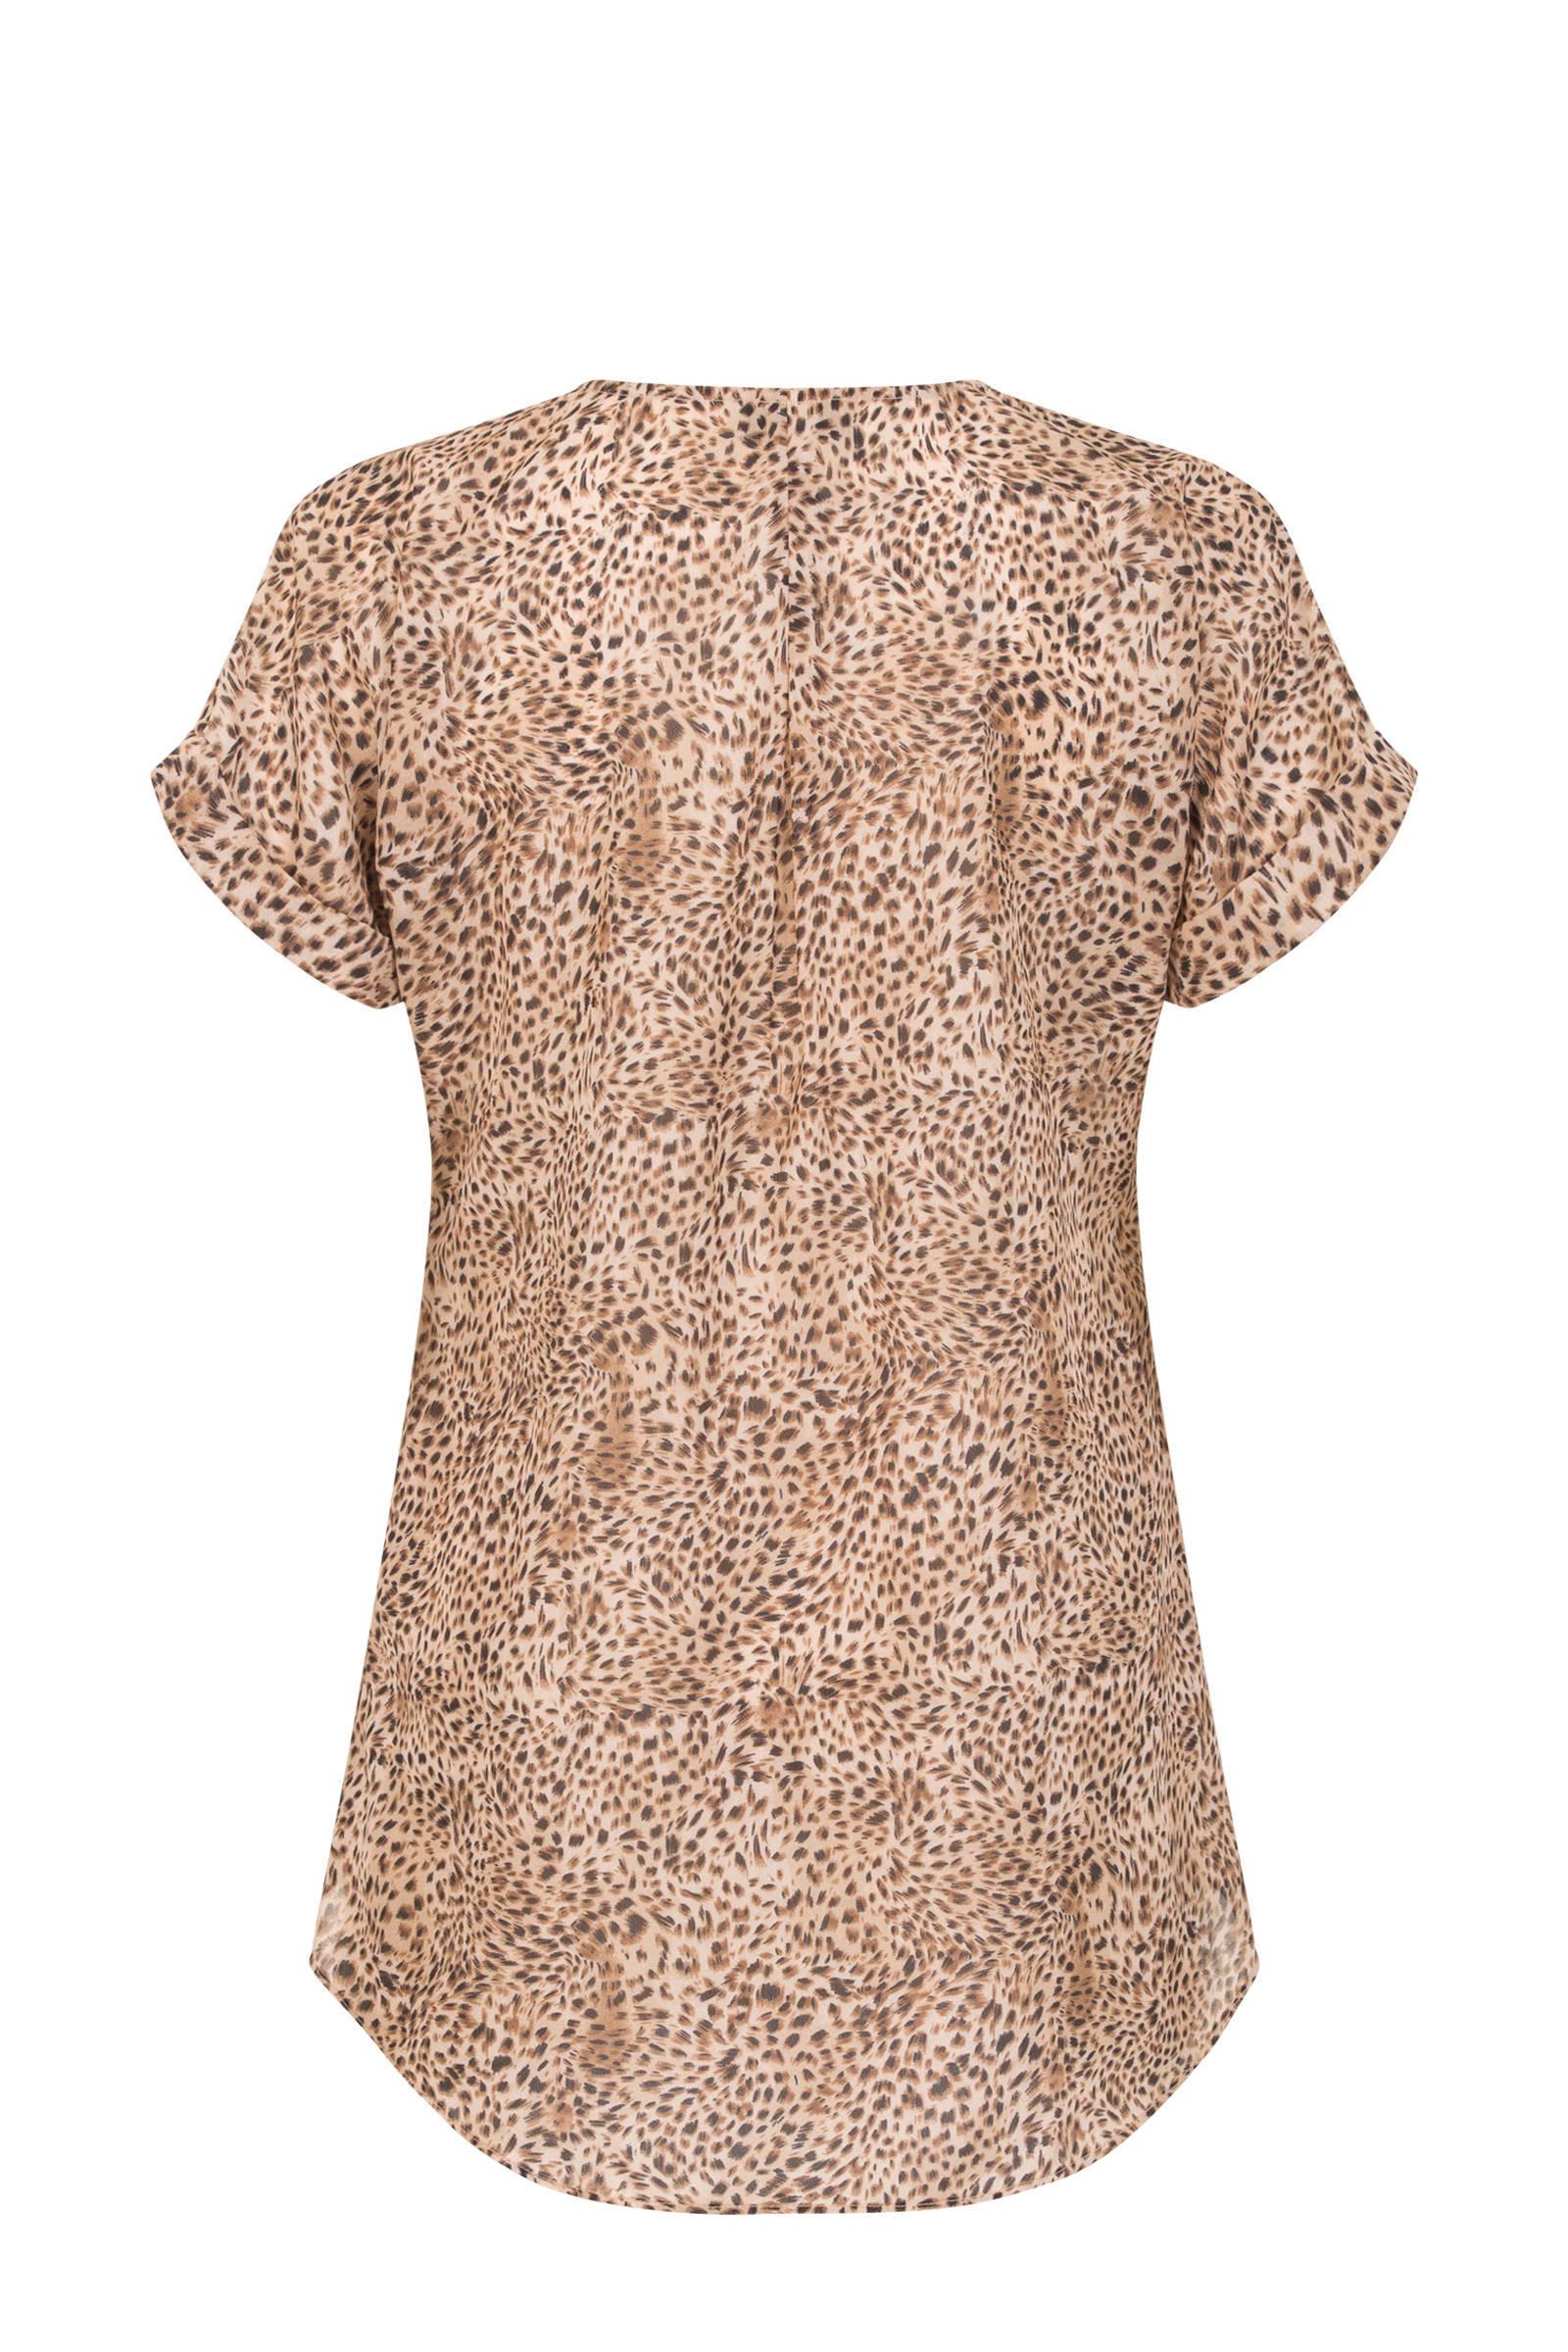 PROMISS T-shirt met all over print bruin